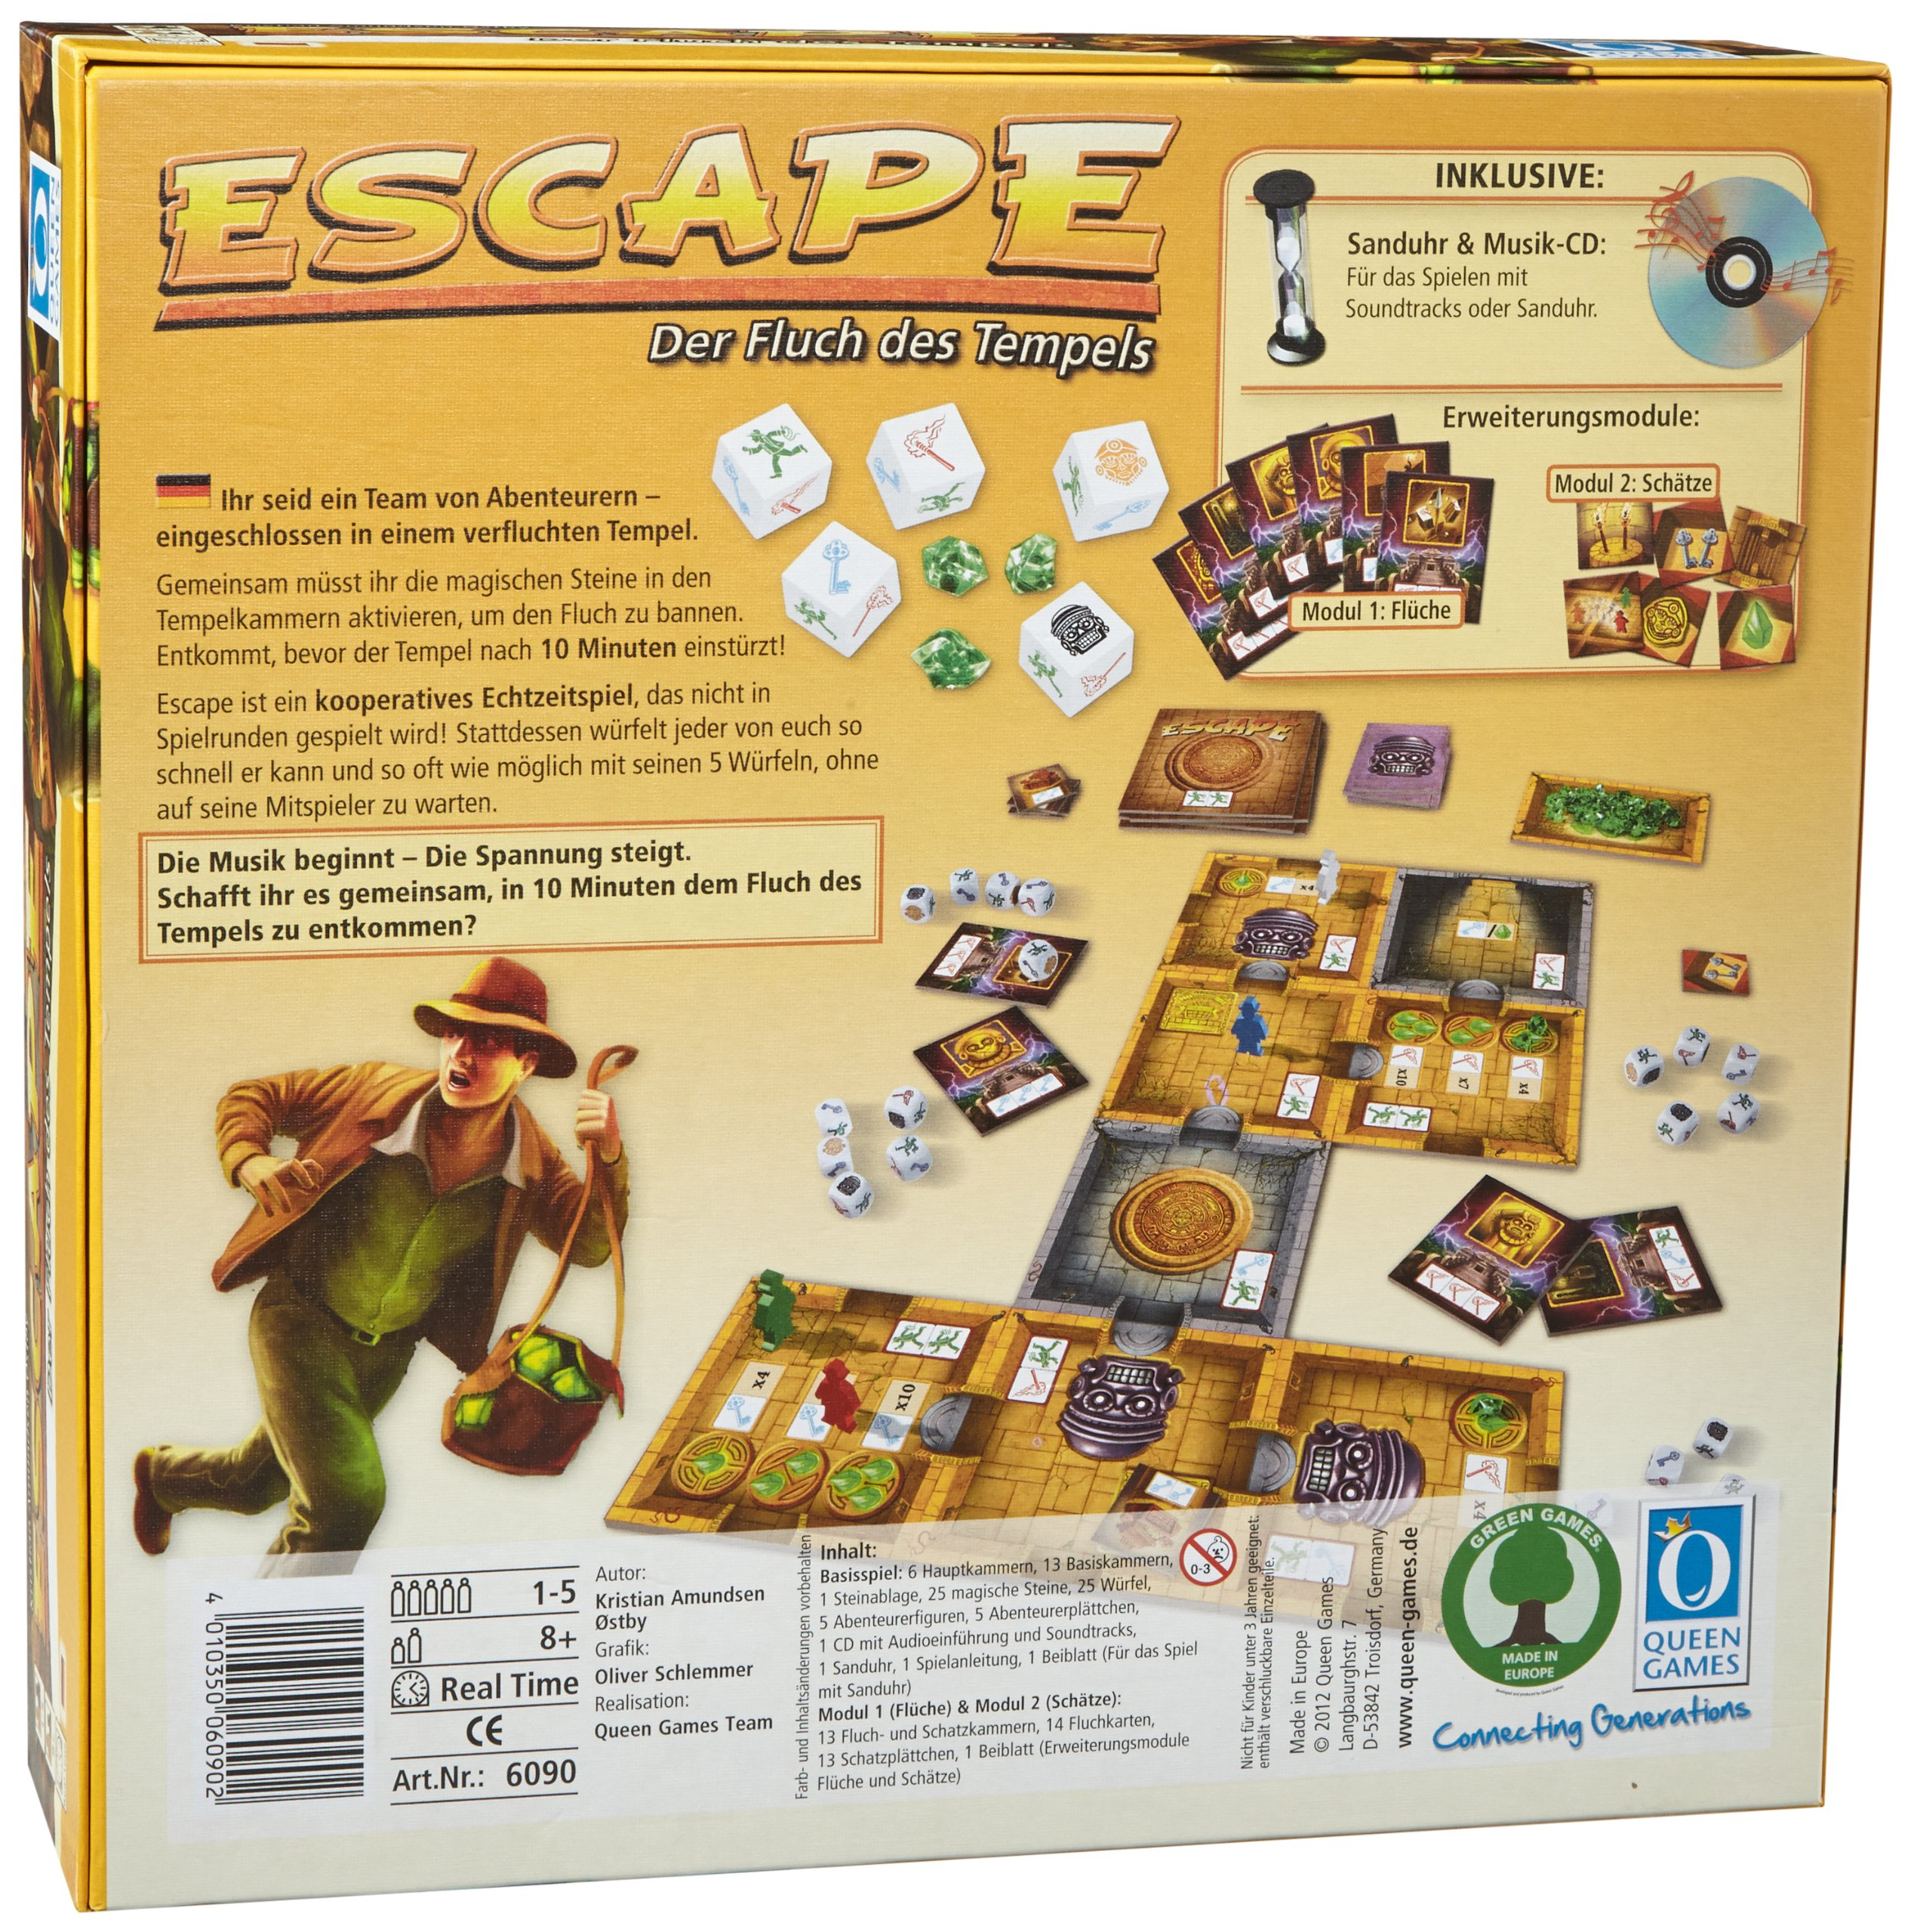 Queen-Games-6090-Escape-Der-Fluch-des-Tempels-kooperatives-Gesellschaftsspiel